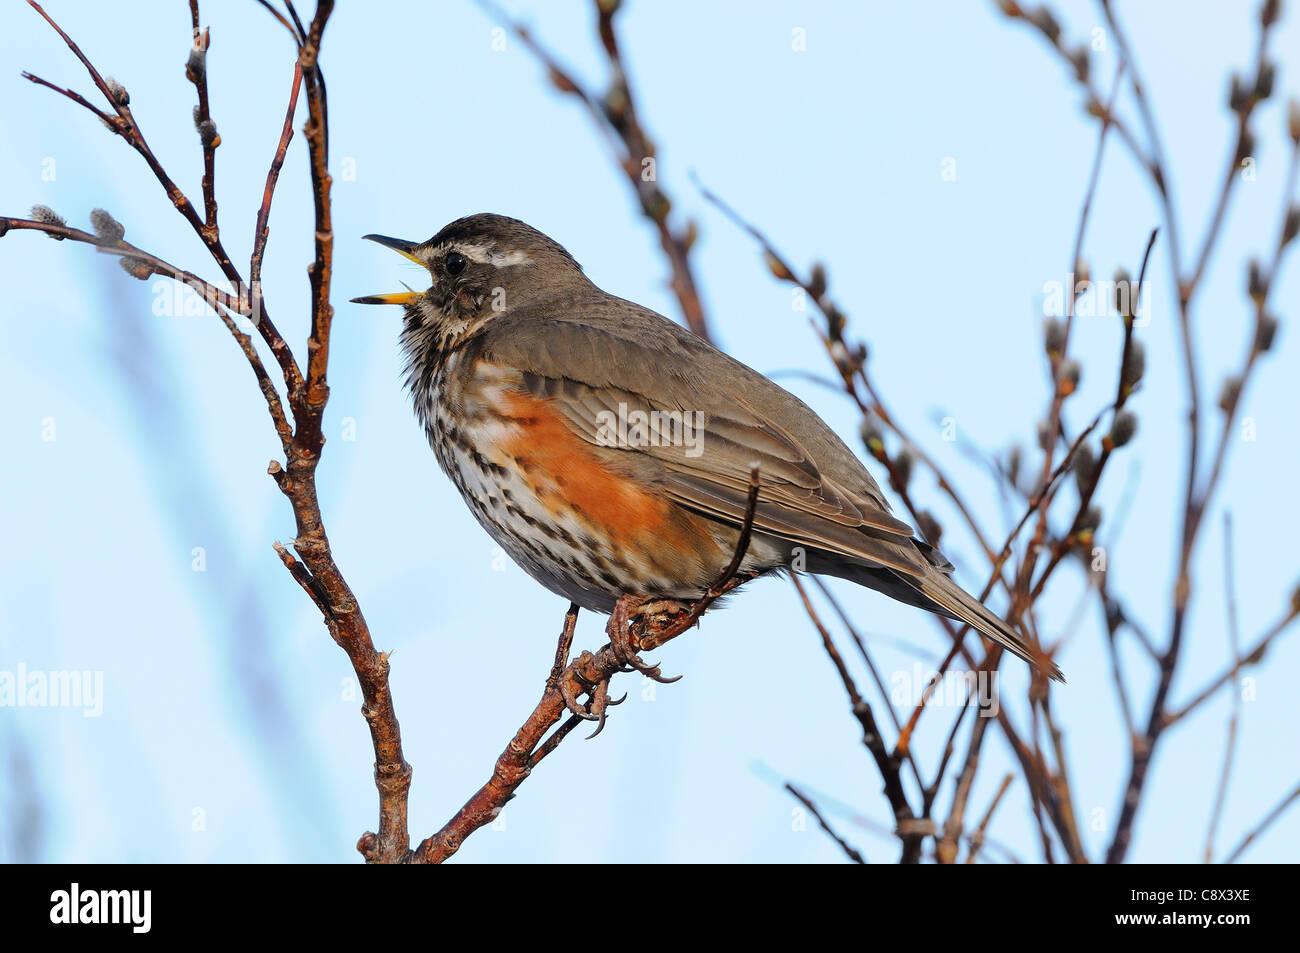 Redwing (Turdus iliacus) adult territorial singing, Varanger, Norway - Stock Image